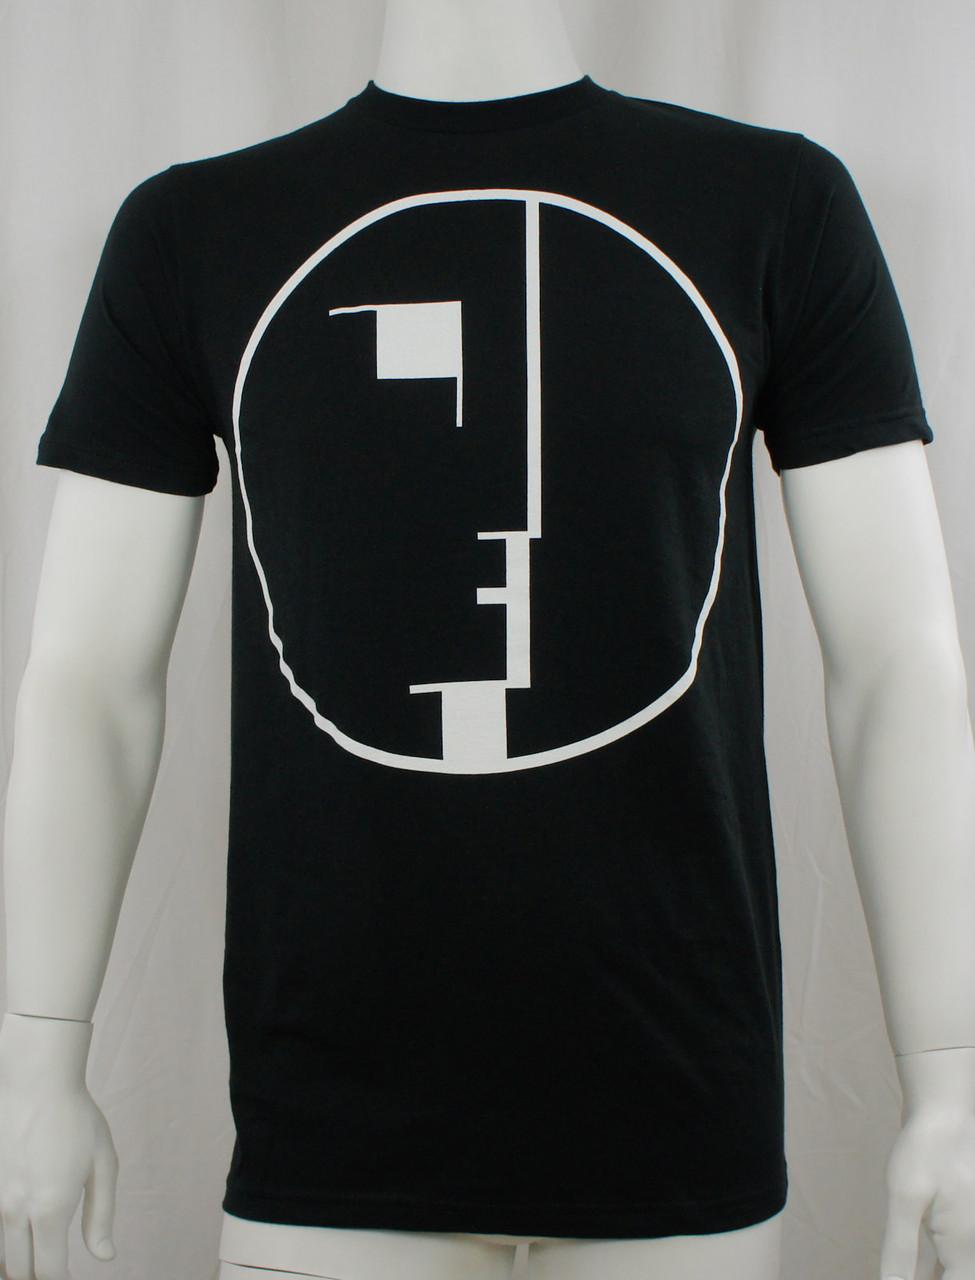 bauhaus t shirt spirit logo merch2rock alternative clothing. Black Bedroom Furniture Sets. Home Design Ideas